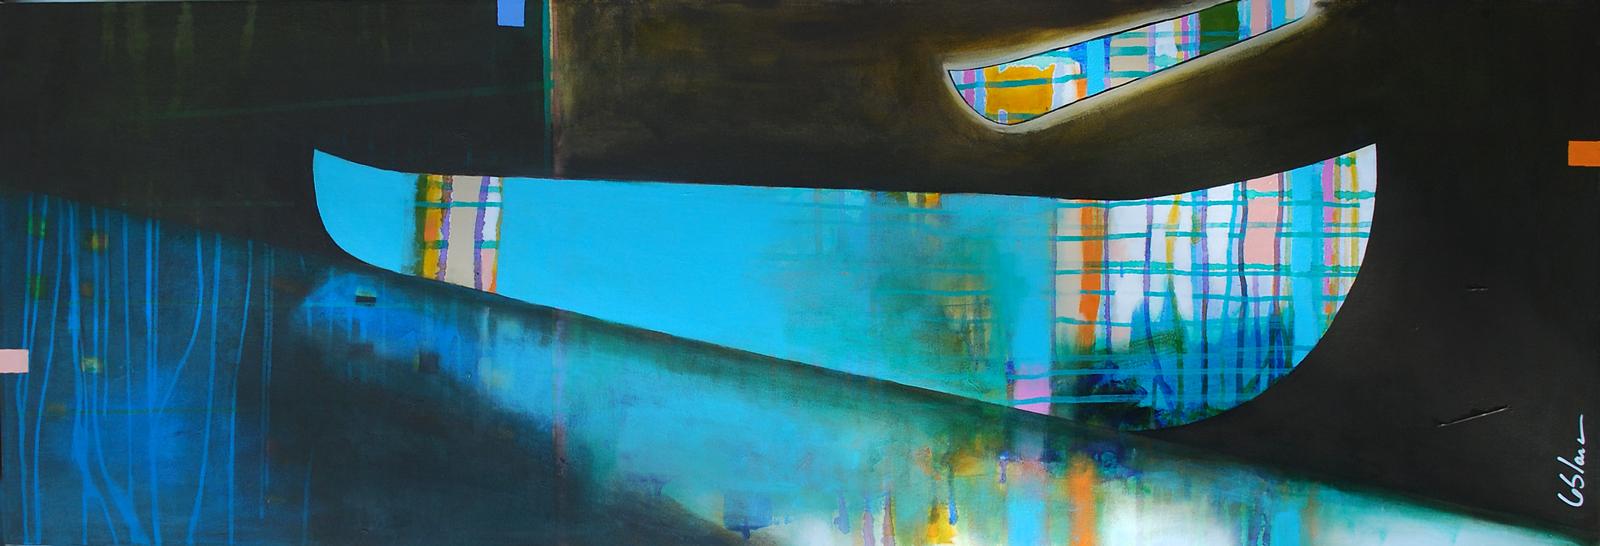 Les Reflets tout Bleu, mixed media canoe painting by Sylvain Leblanc | Effusion Art Gallery + Glass Studio, Invermere BC